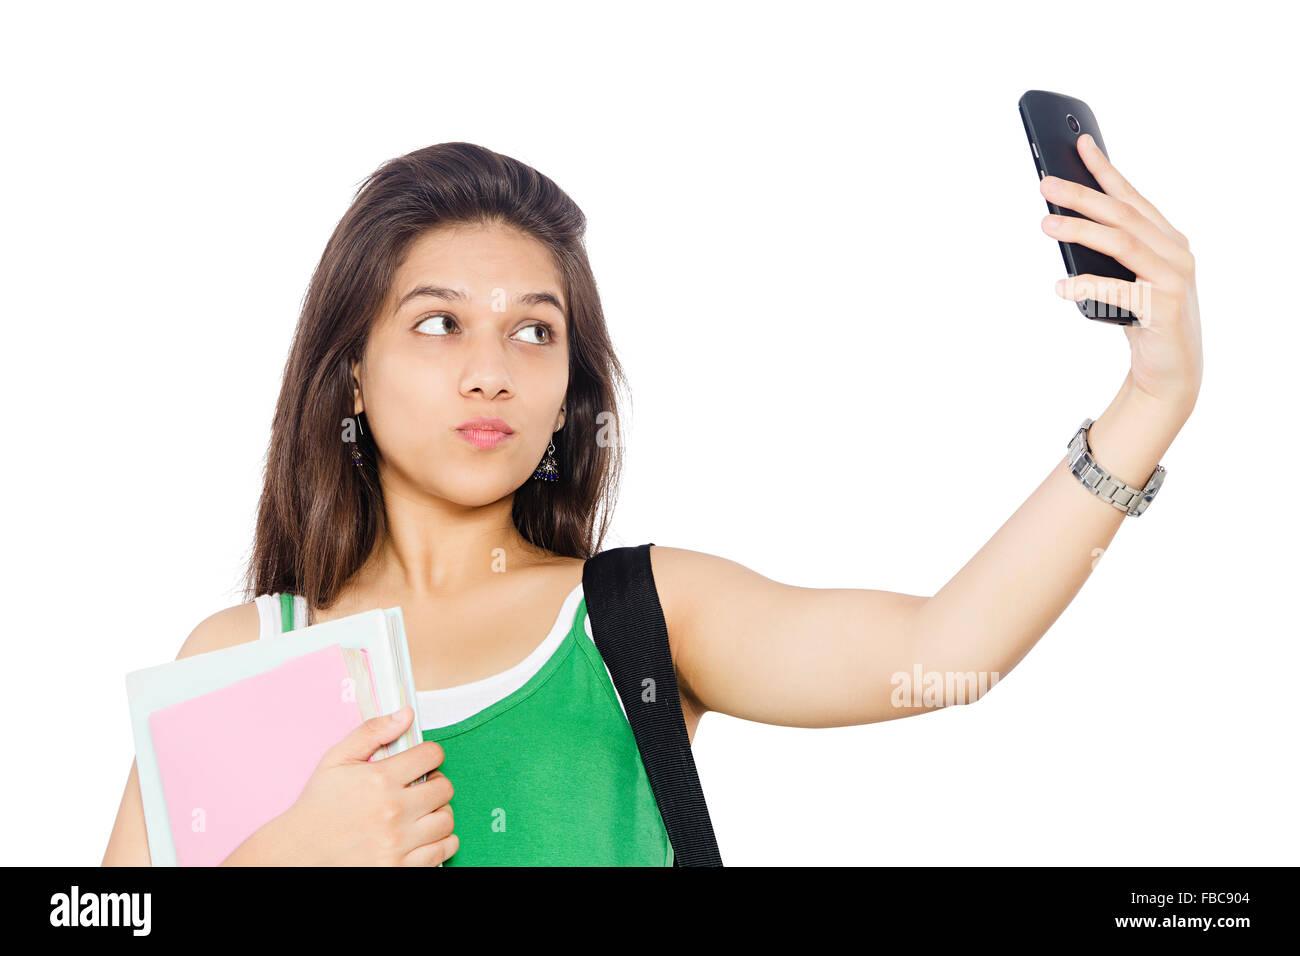 Young teen naked cellphone pics photos